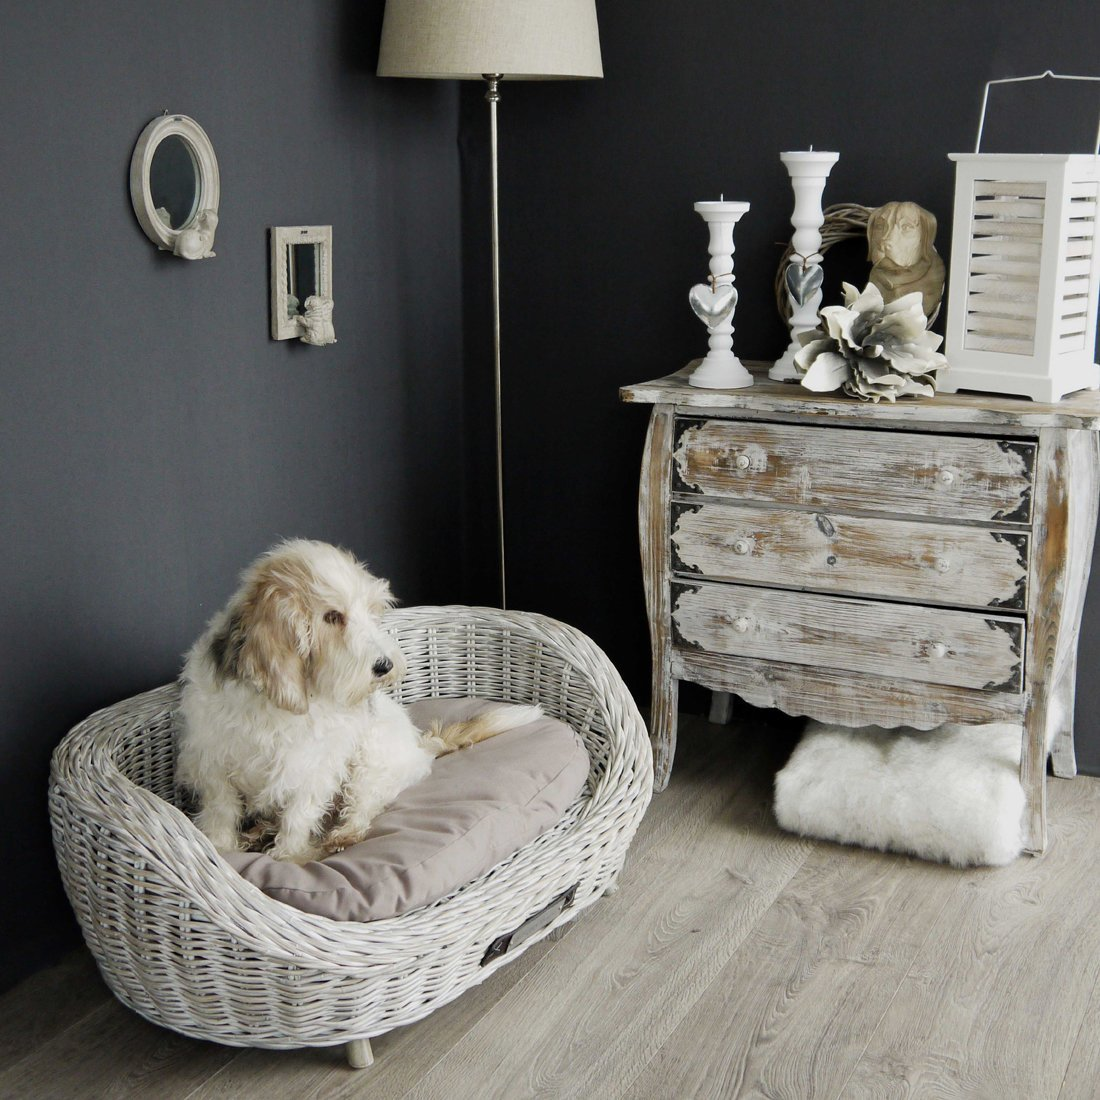 Happy House Hundesofa aus Rattan weiss, Bild 2